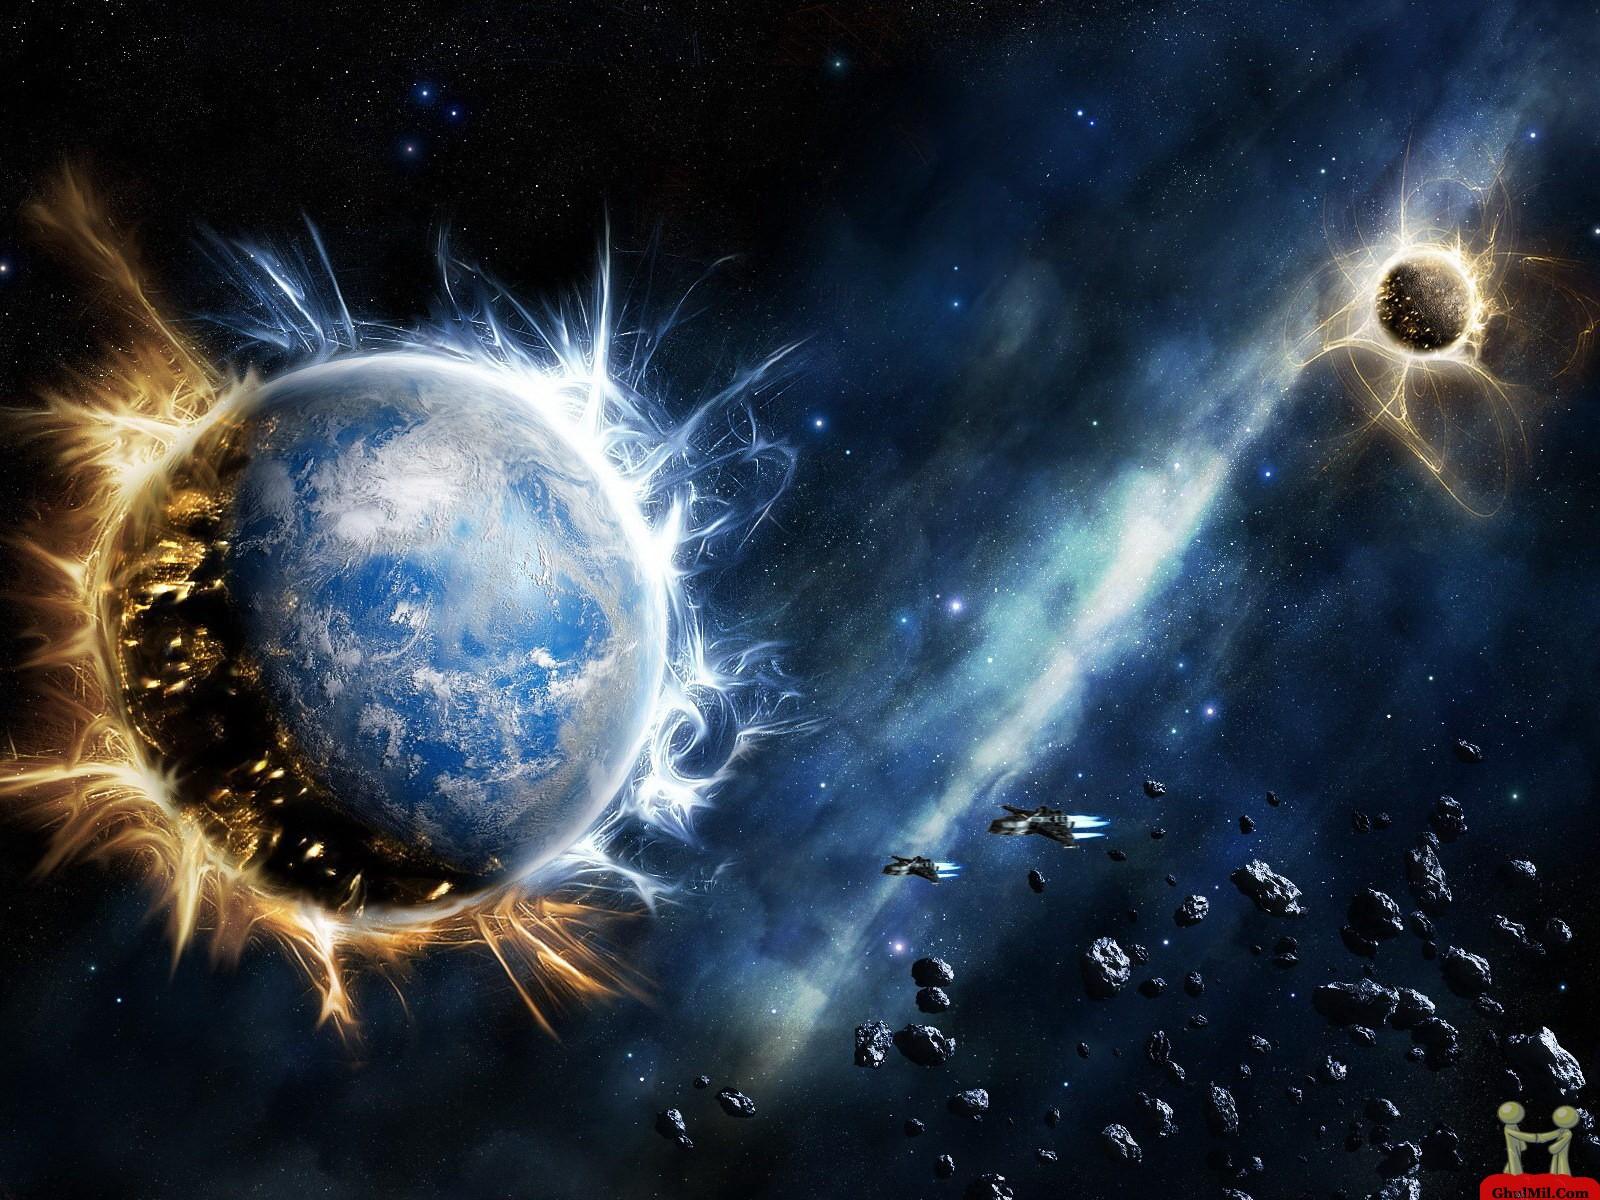 3D Planets Desktops Wallpapers HD Wallpapers Download 1600x1200